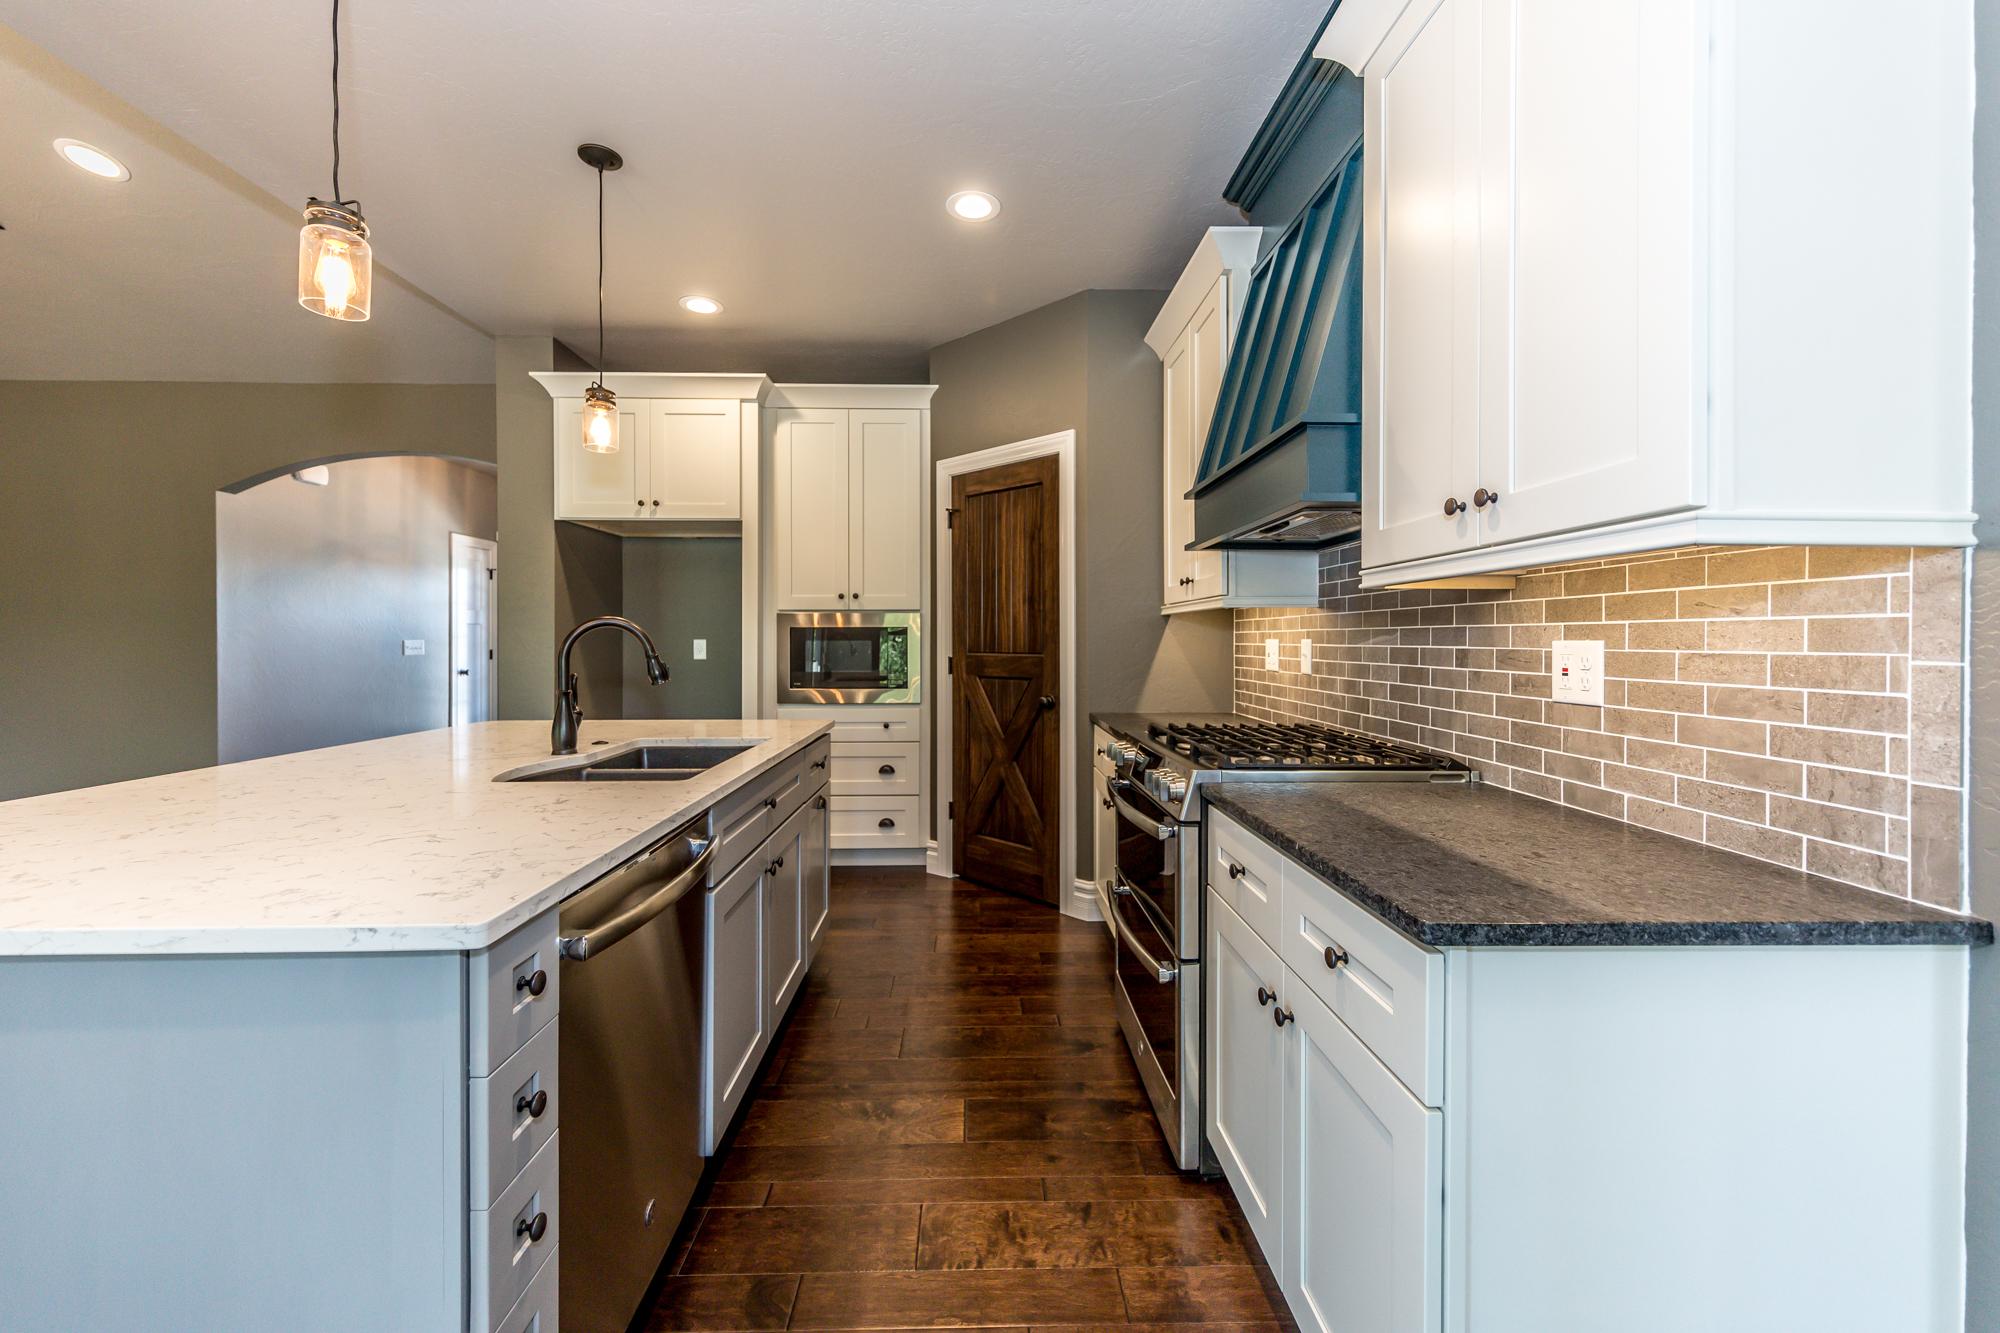 Home_For_Sale_O'Fallon_Illinois_Scott_AFB_CR_Holland-8.jpg